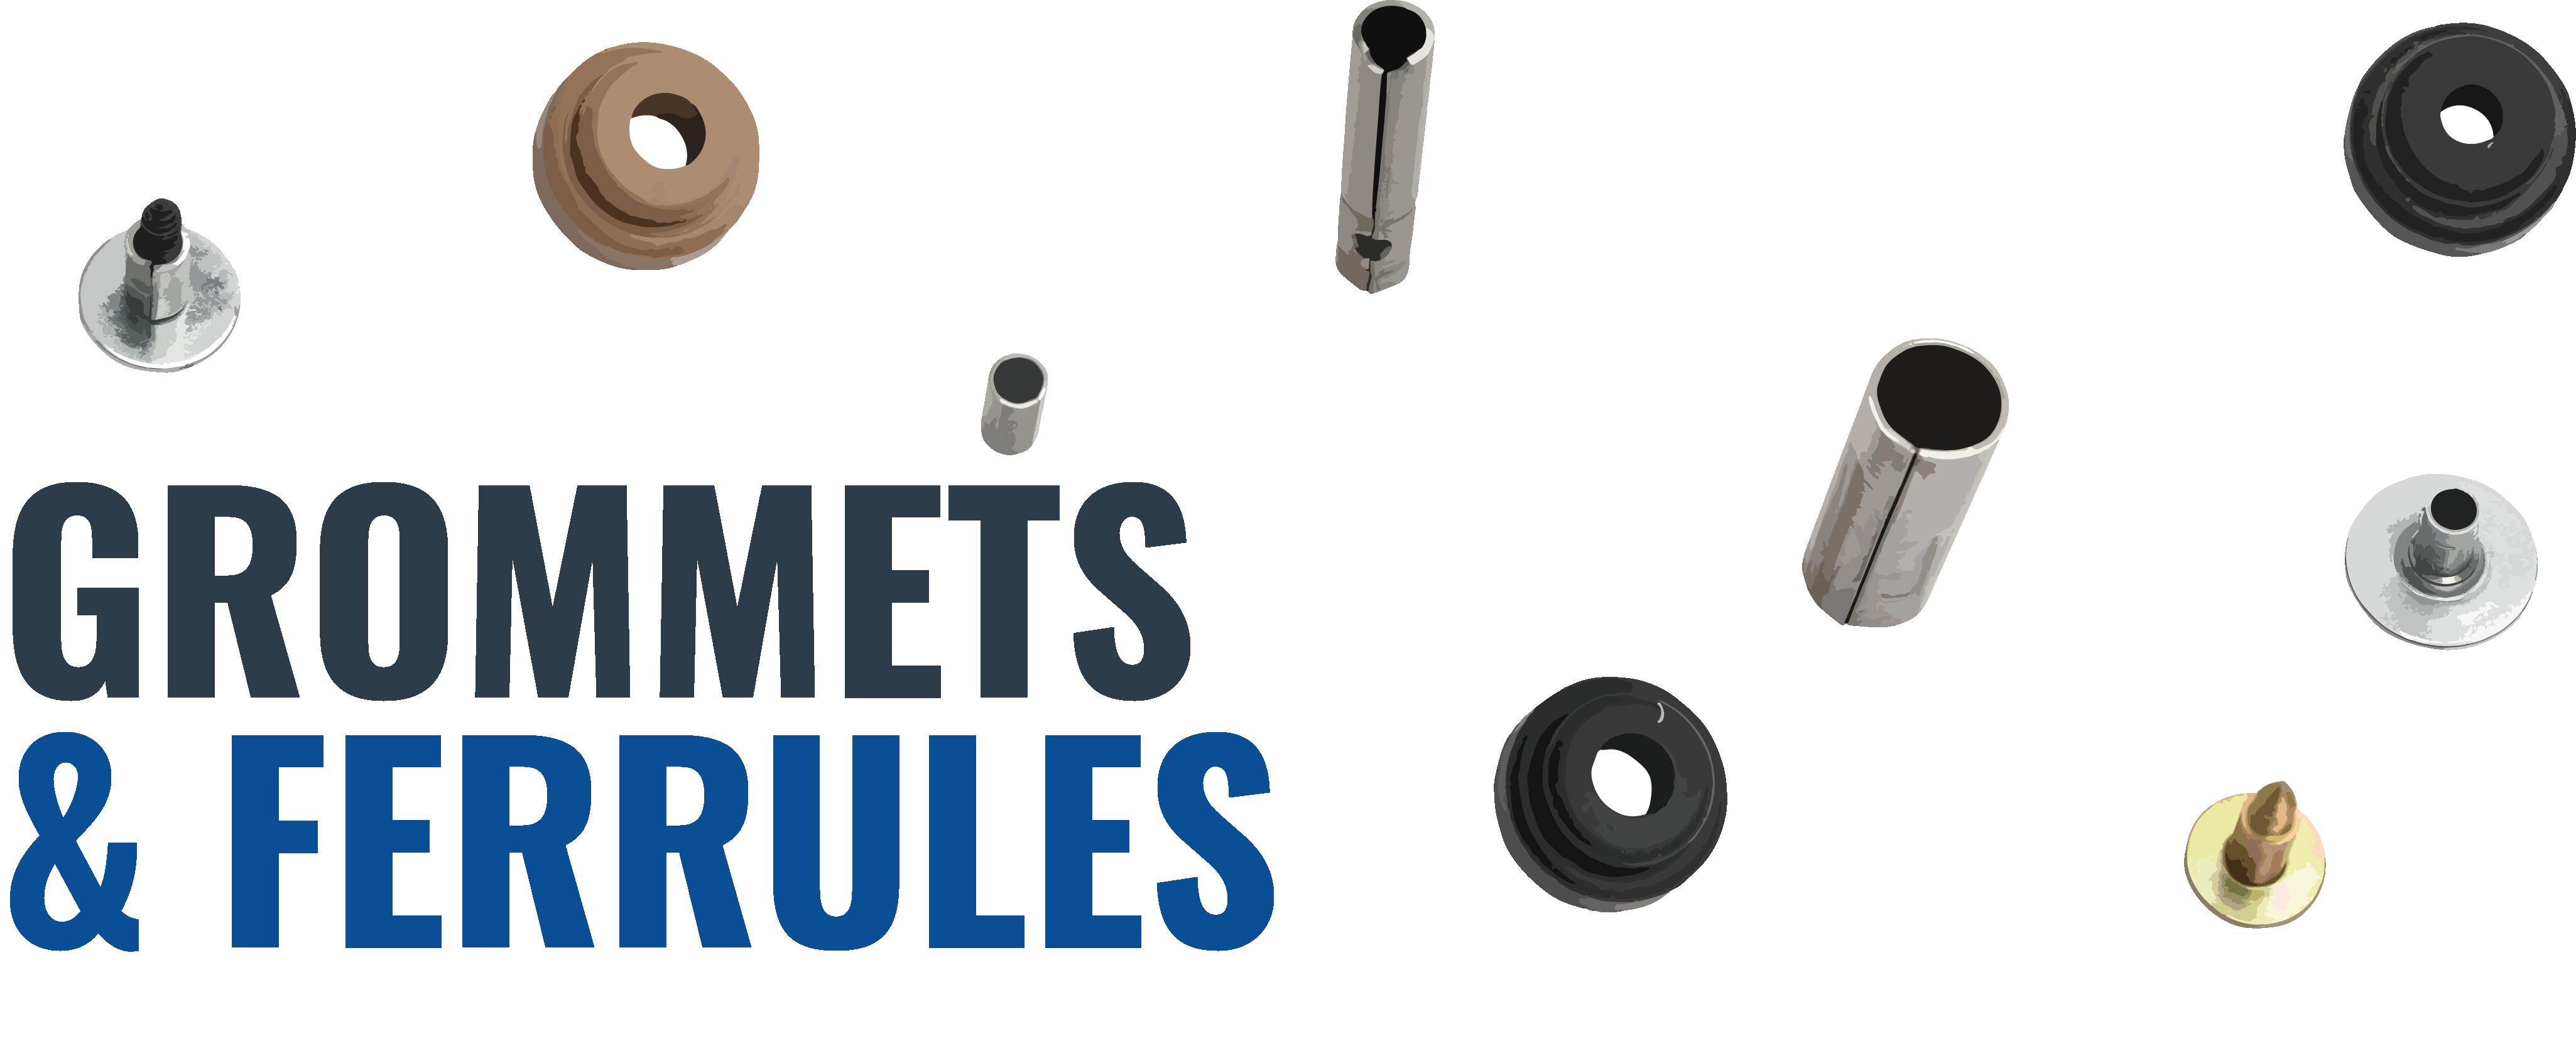 Rubber Grommet & Ferrule Options for Triangle's Motor Mount Bracket Arms